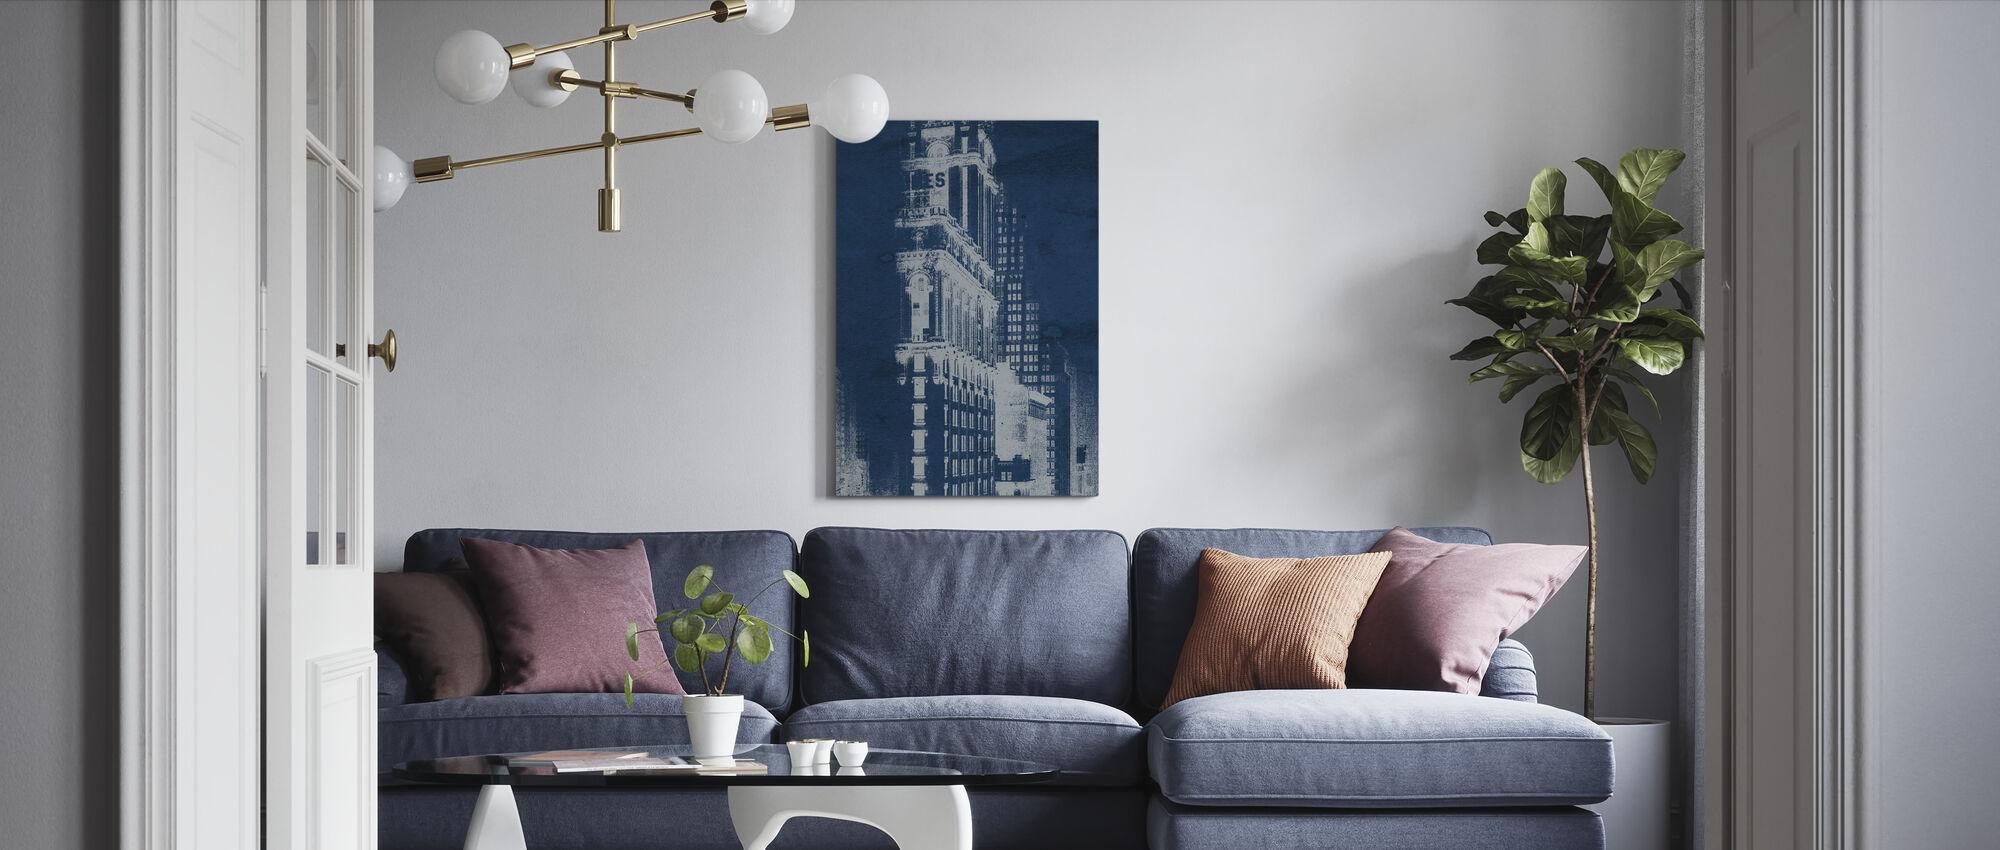 Times Square Prentkaart Blauwdruk Panel - Canvas print - Woonkamer